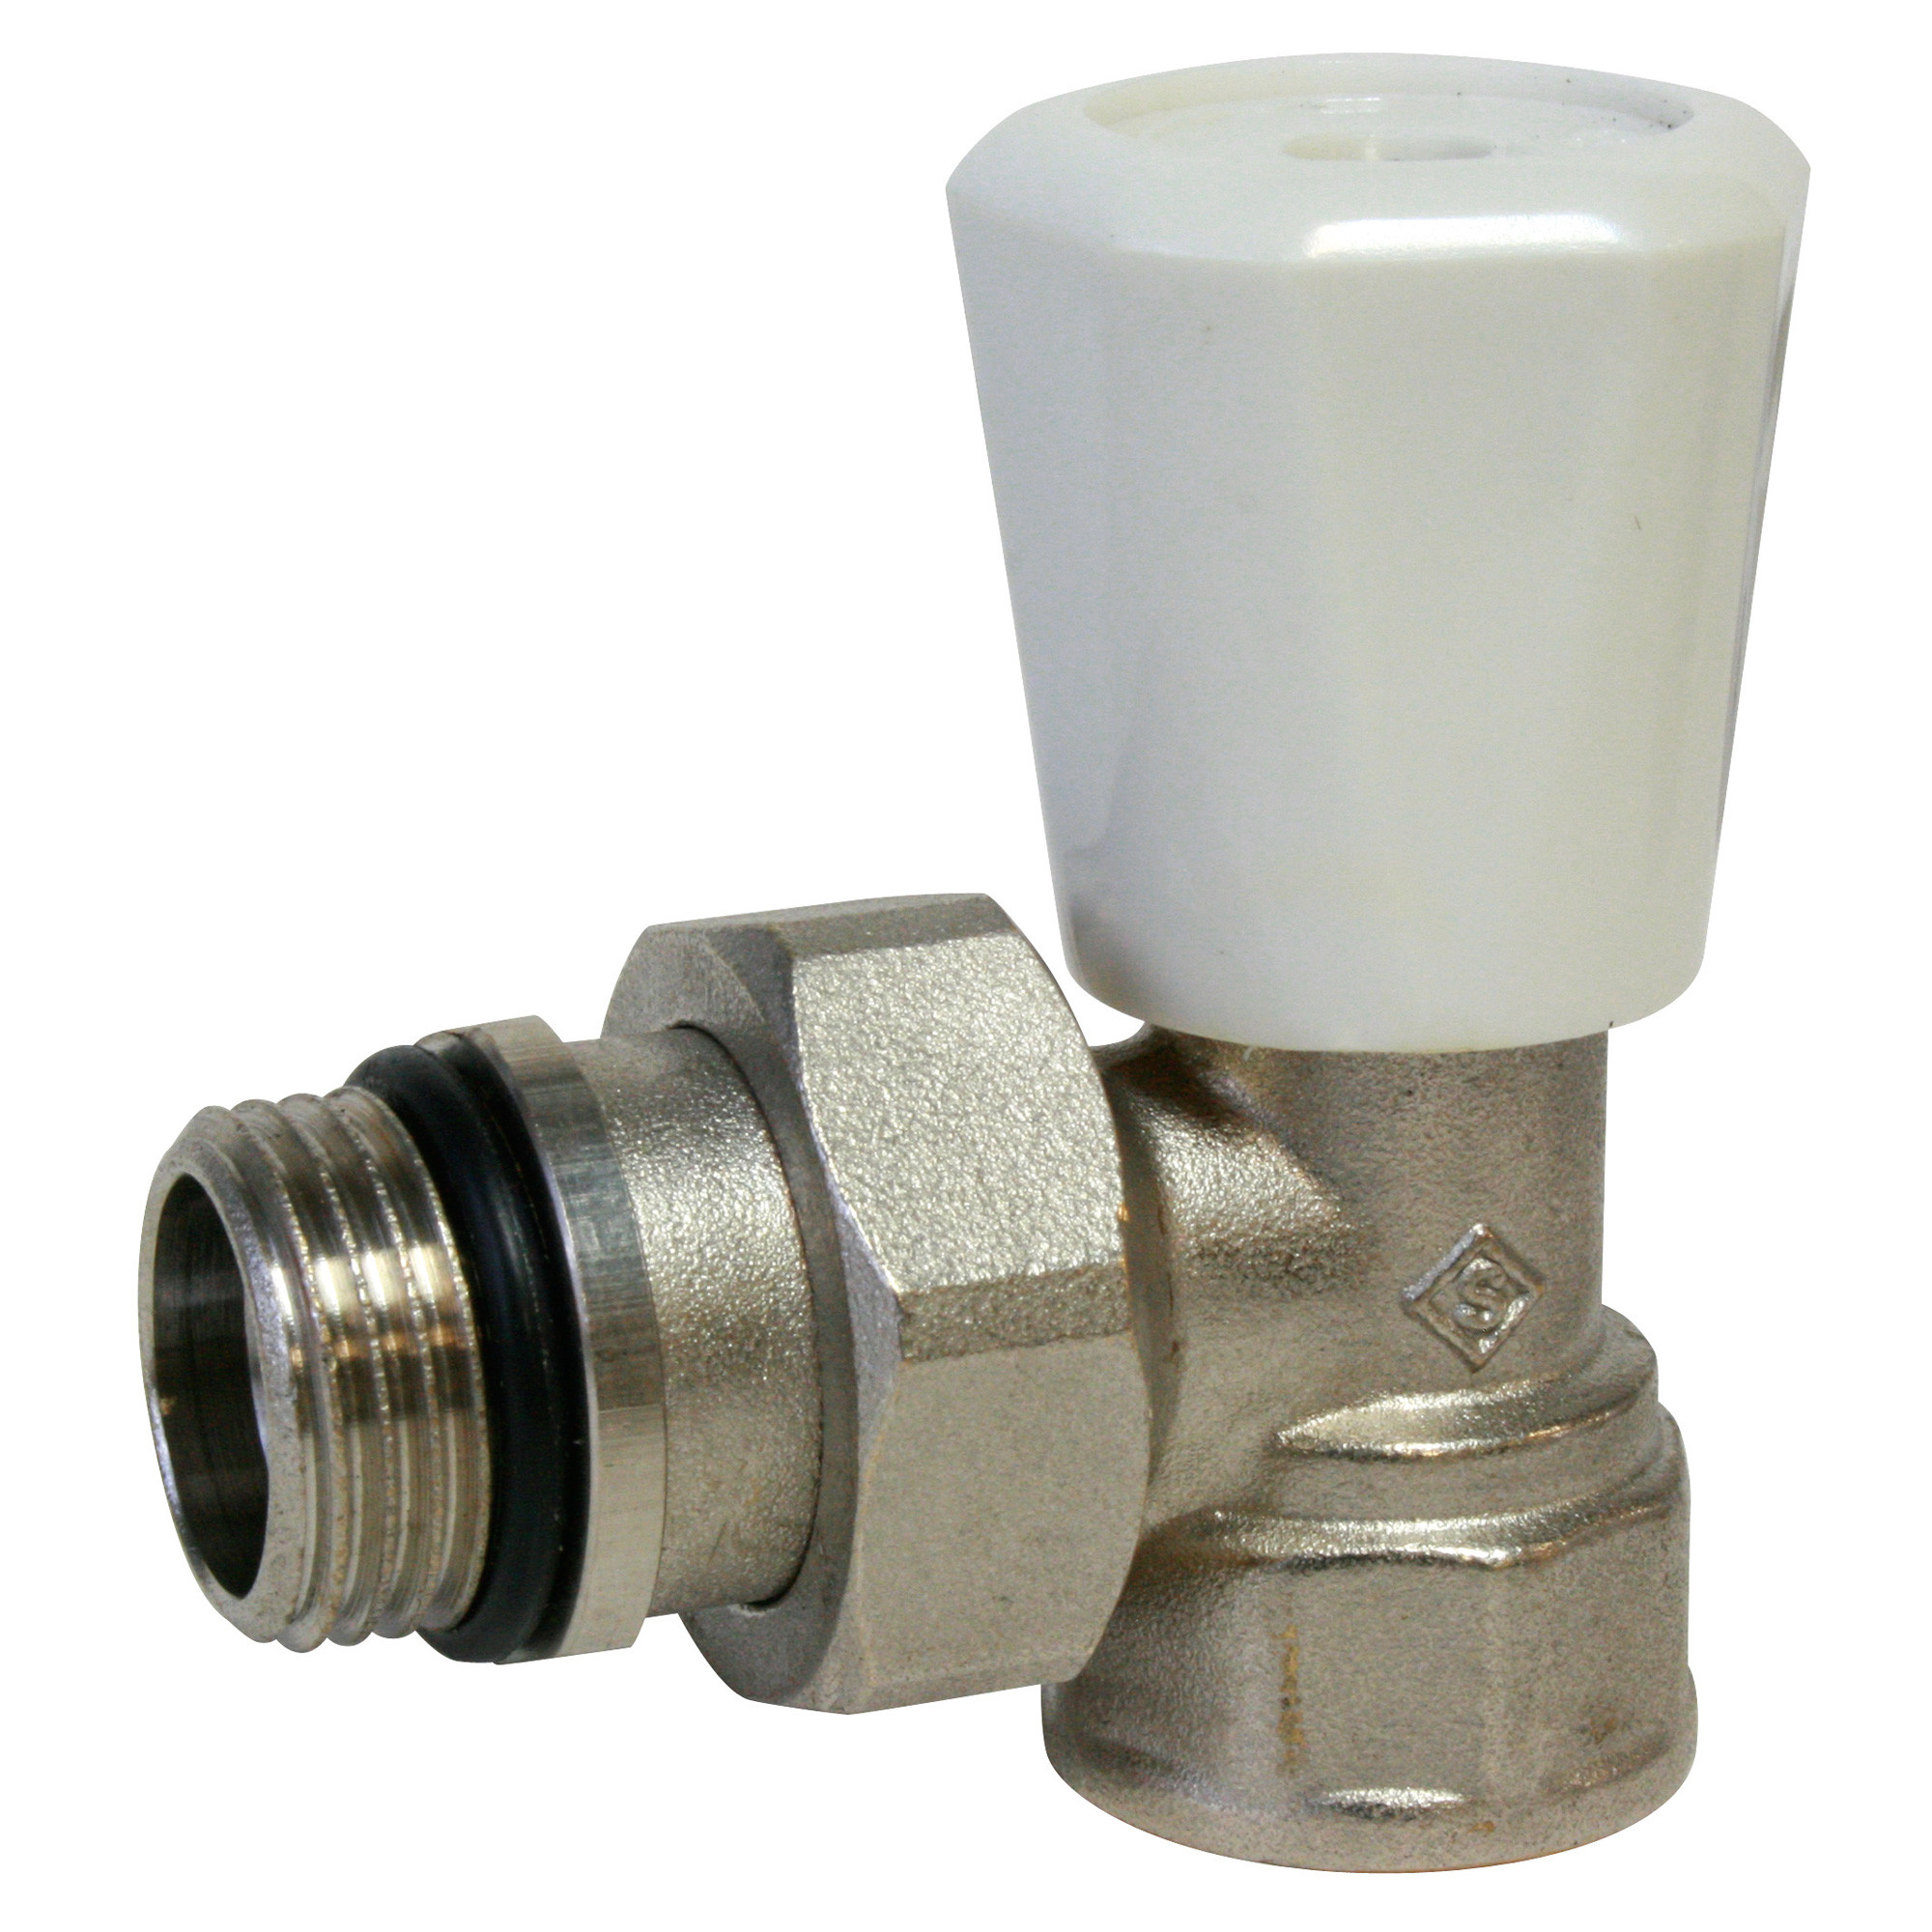 Robinet simple r glage corps equerre anjou connectique - Reglage robinet thermostatique ...